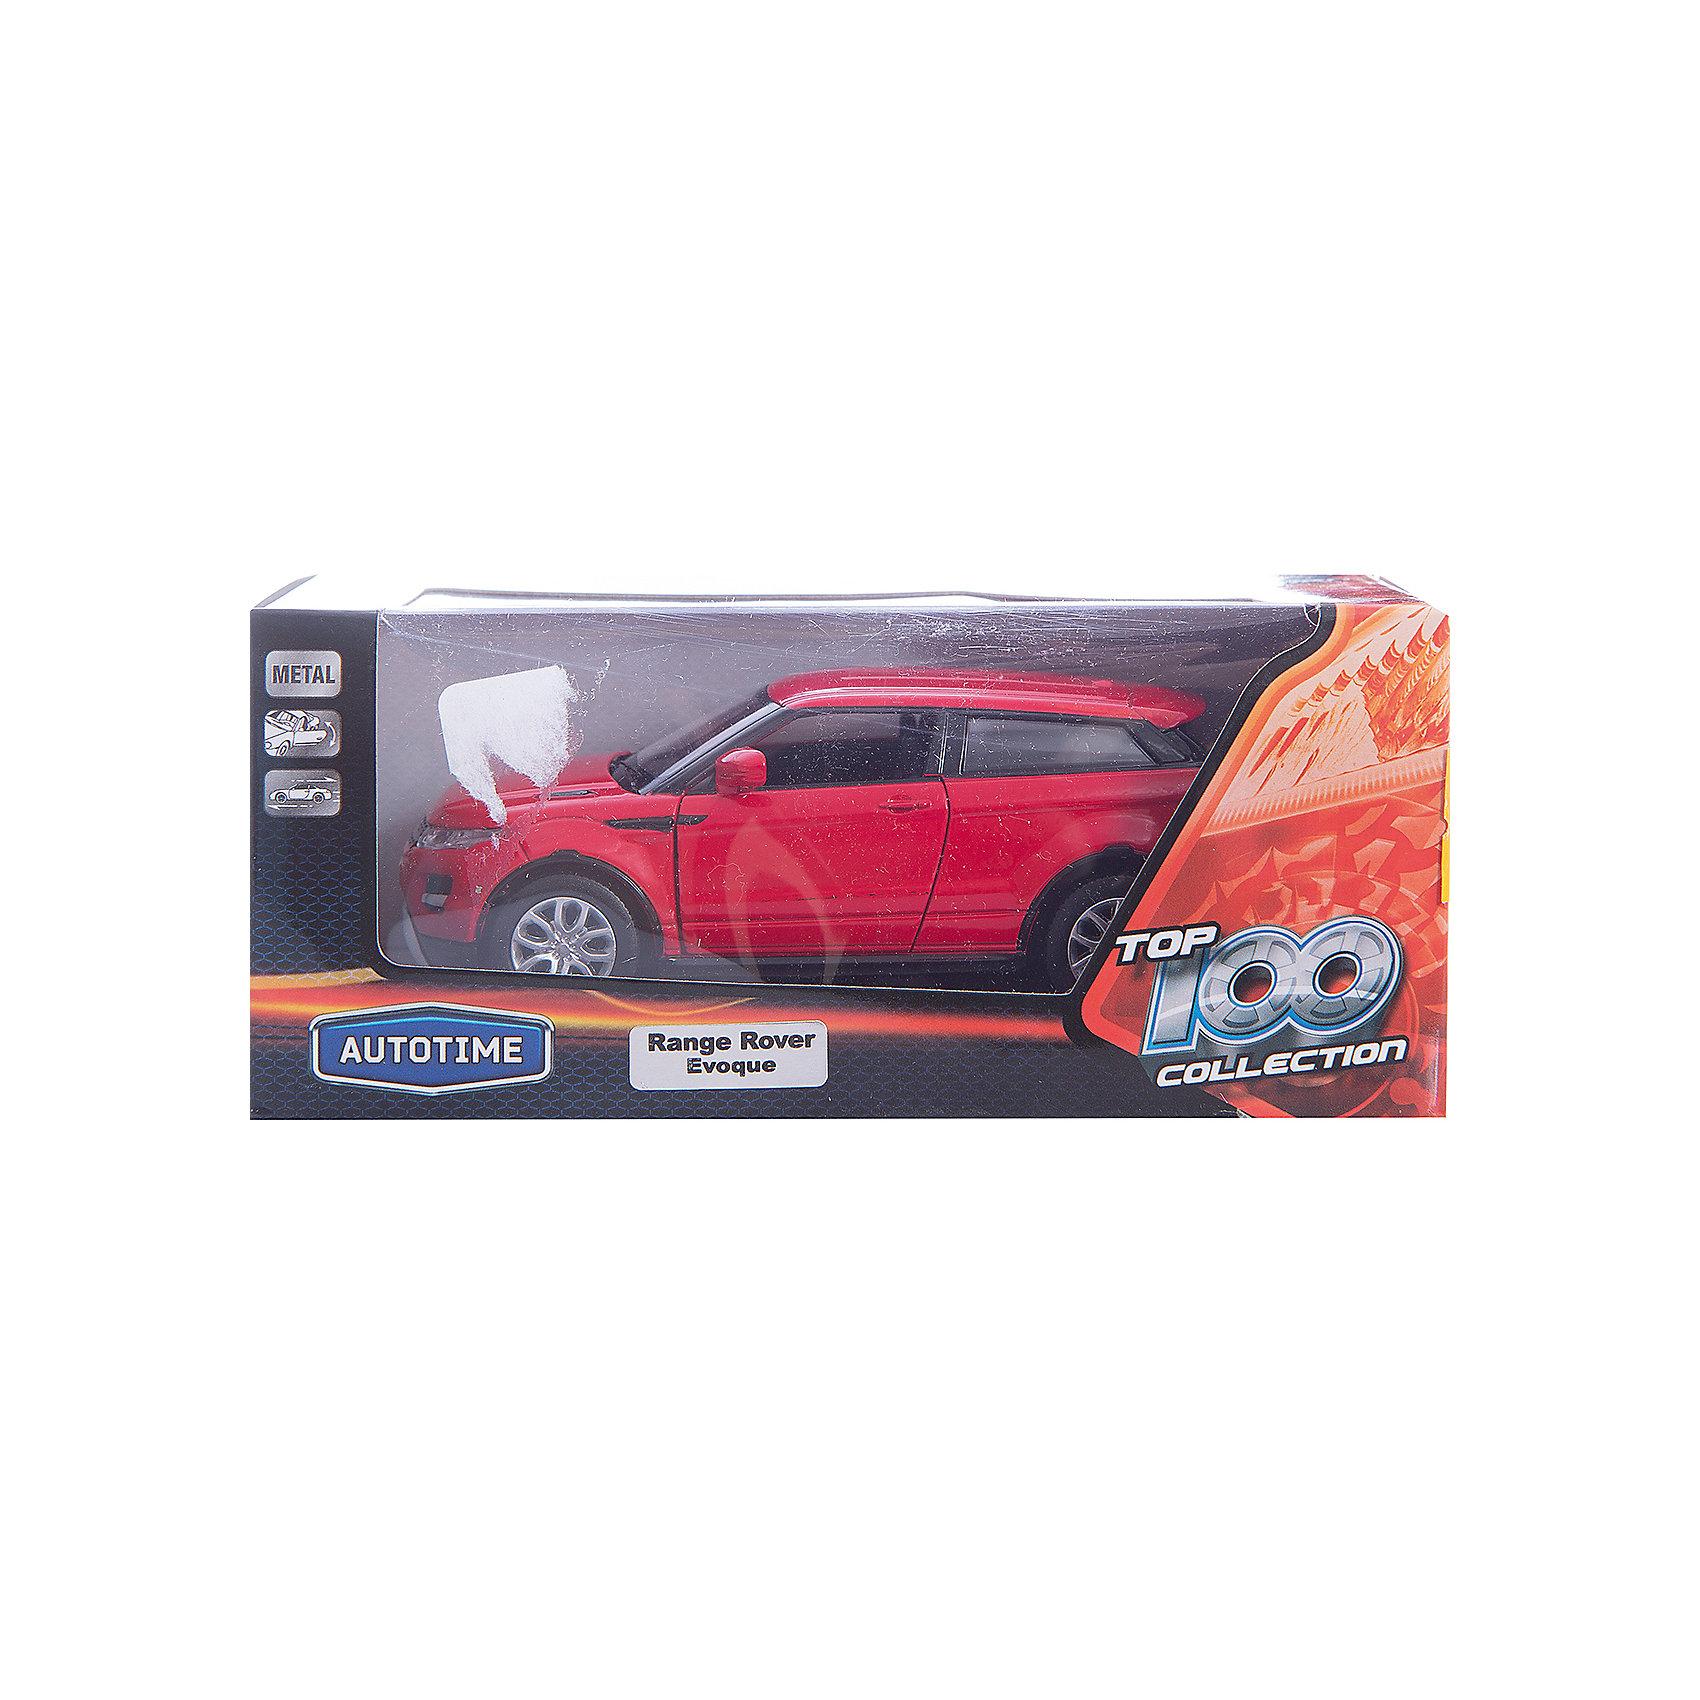 Машинка Range Rover Evoque 5, AutotimeМашинки<br><br><br>Ширина мм: 165<br>Глубина мм: 57<br>Высота мм: 75<br>Вес г: 13<br>Возраст от месяцев: 36<br>Возраст до месяцев: 2147483647<br>Пол: Мужской<br>Возраст: Детский<br>SKU: 5584109